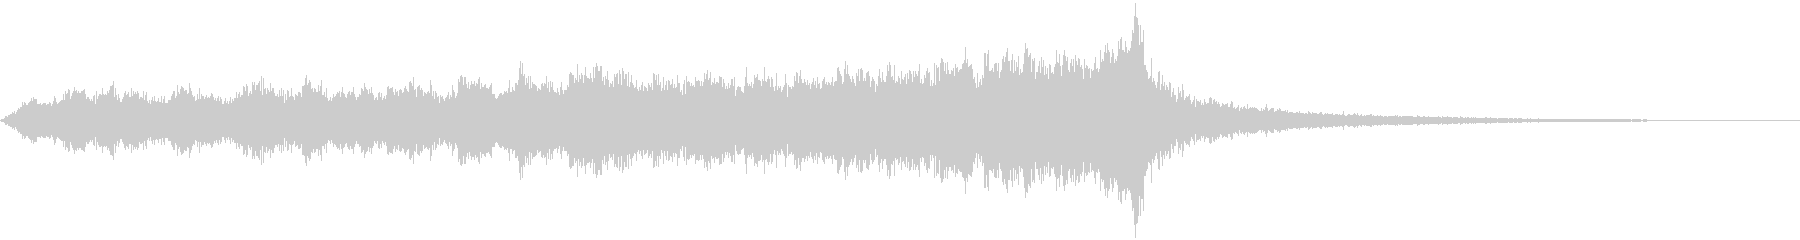 CINEMATIC RISER_17の未再生の波形